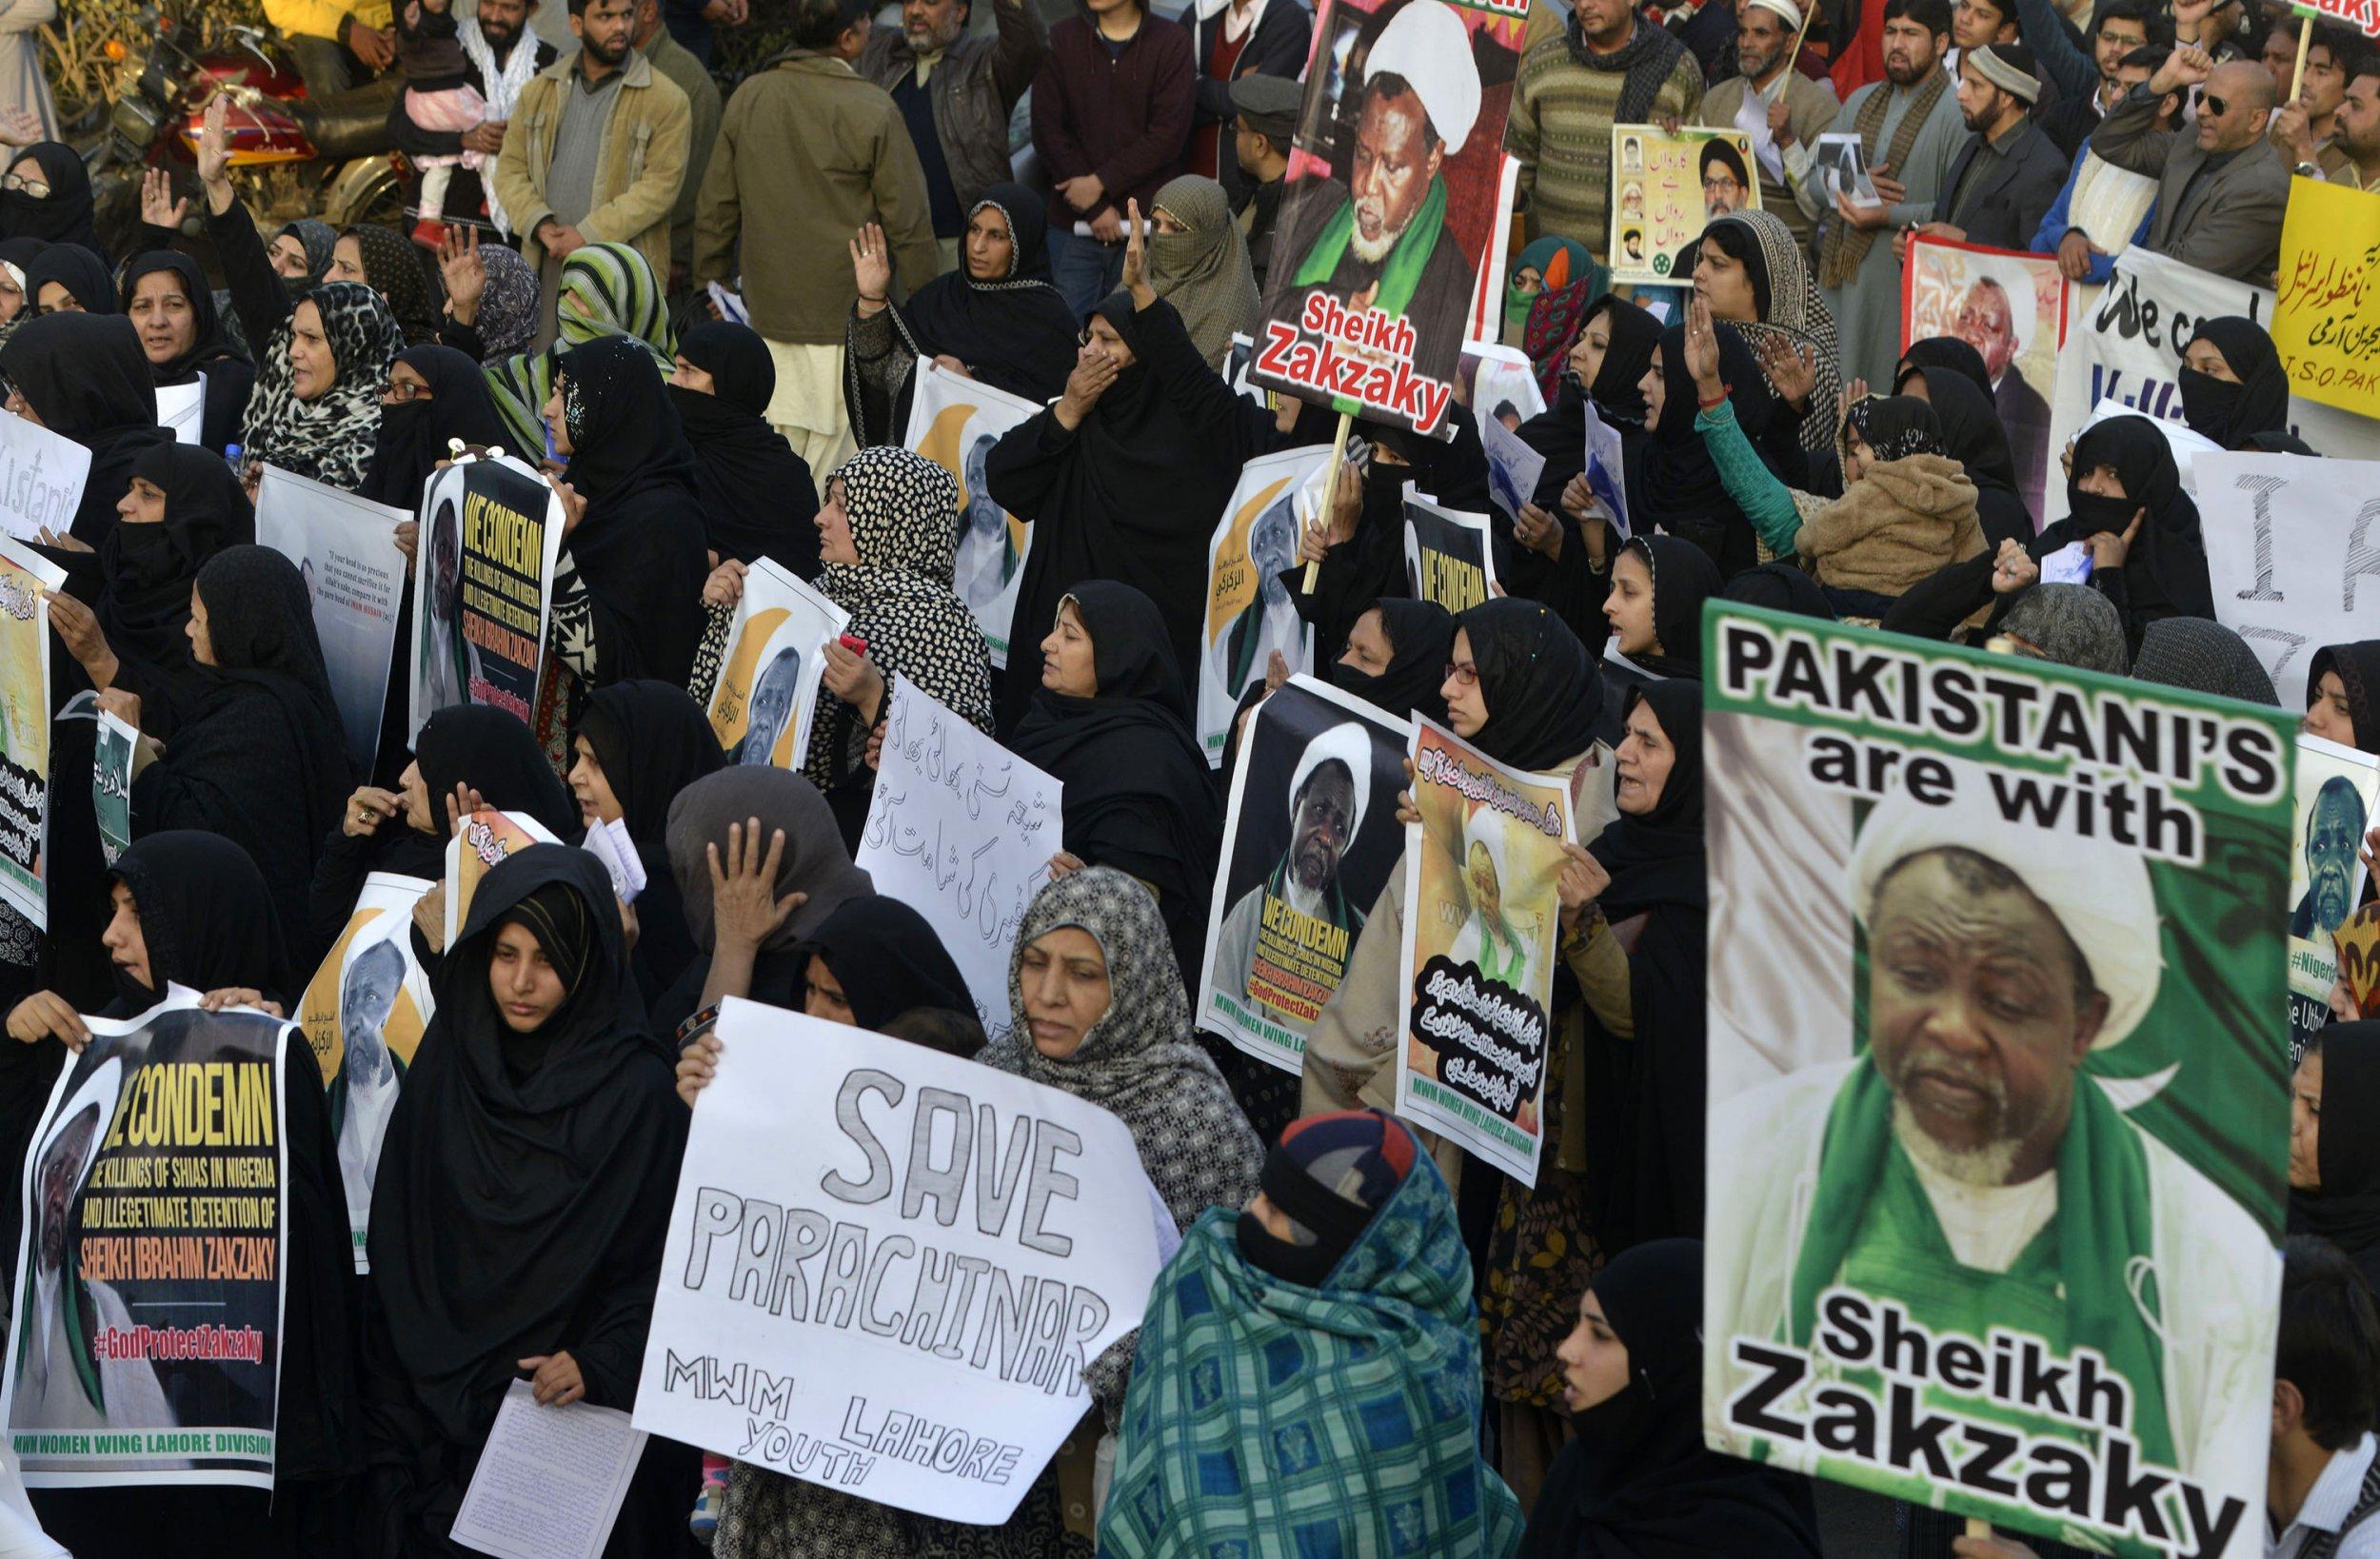 Shiites in Pakistan protest against Sheikh Zakzaky's detention.